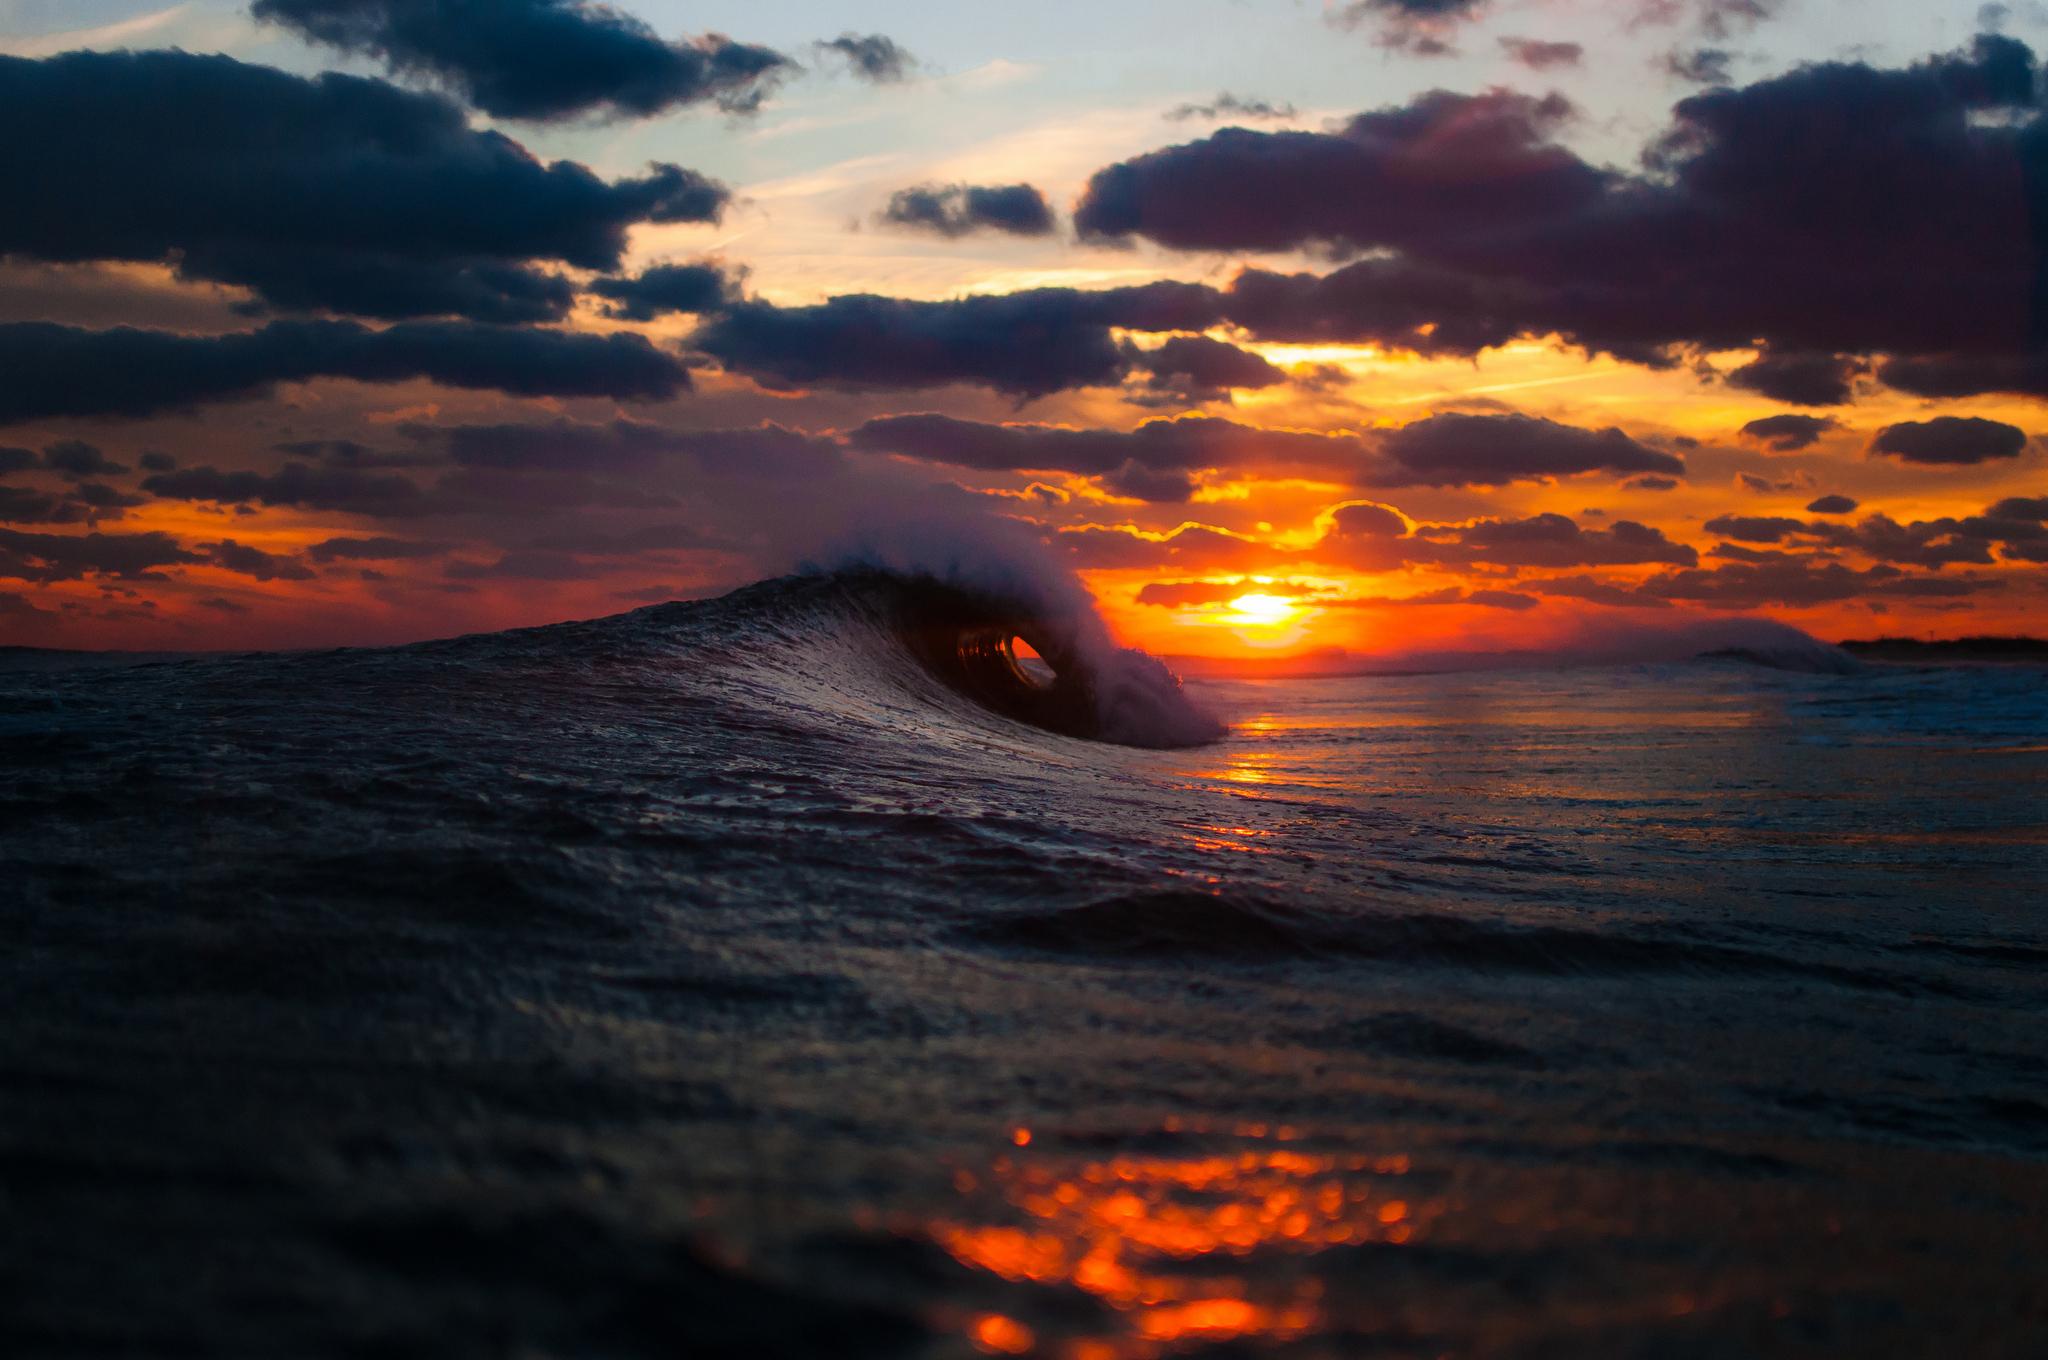 ocean waves sunset photos ocean waves sunset photos ocean waves 2048x1360